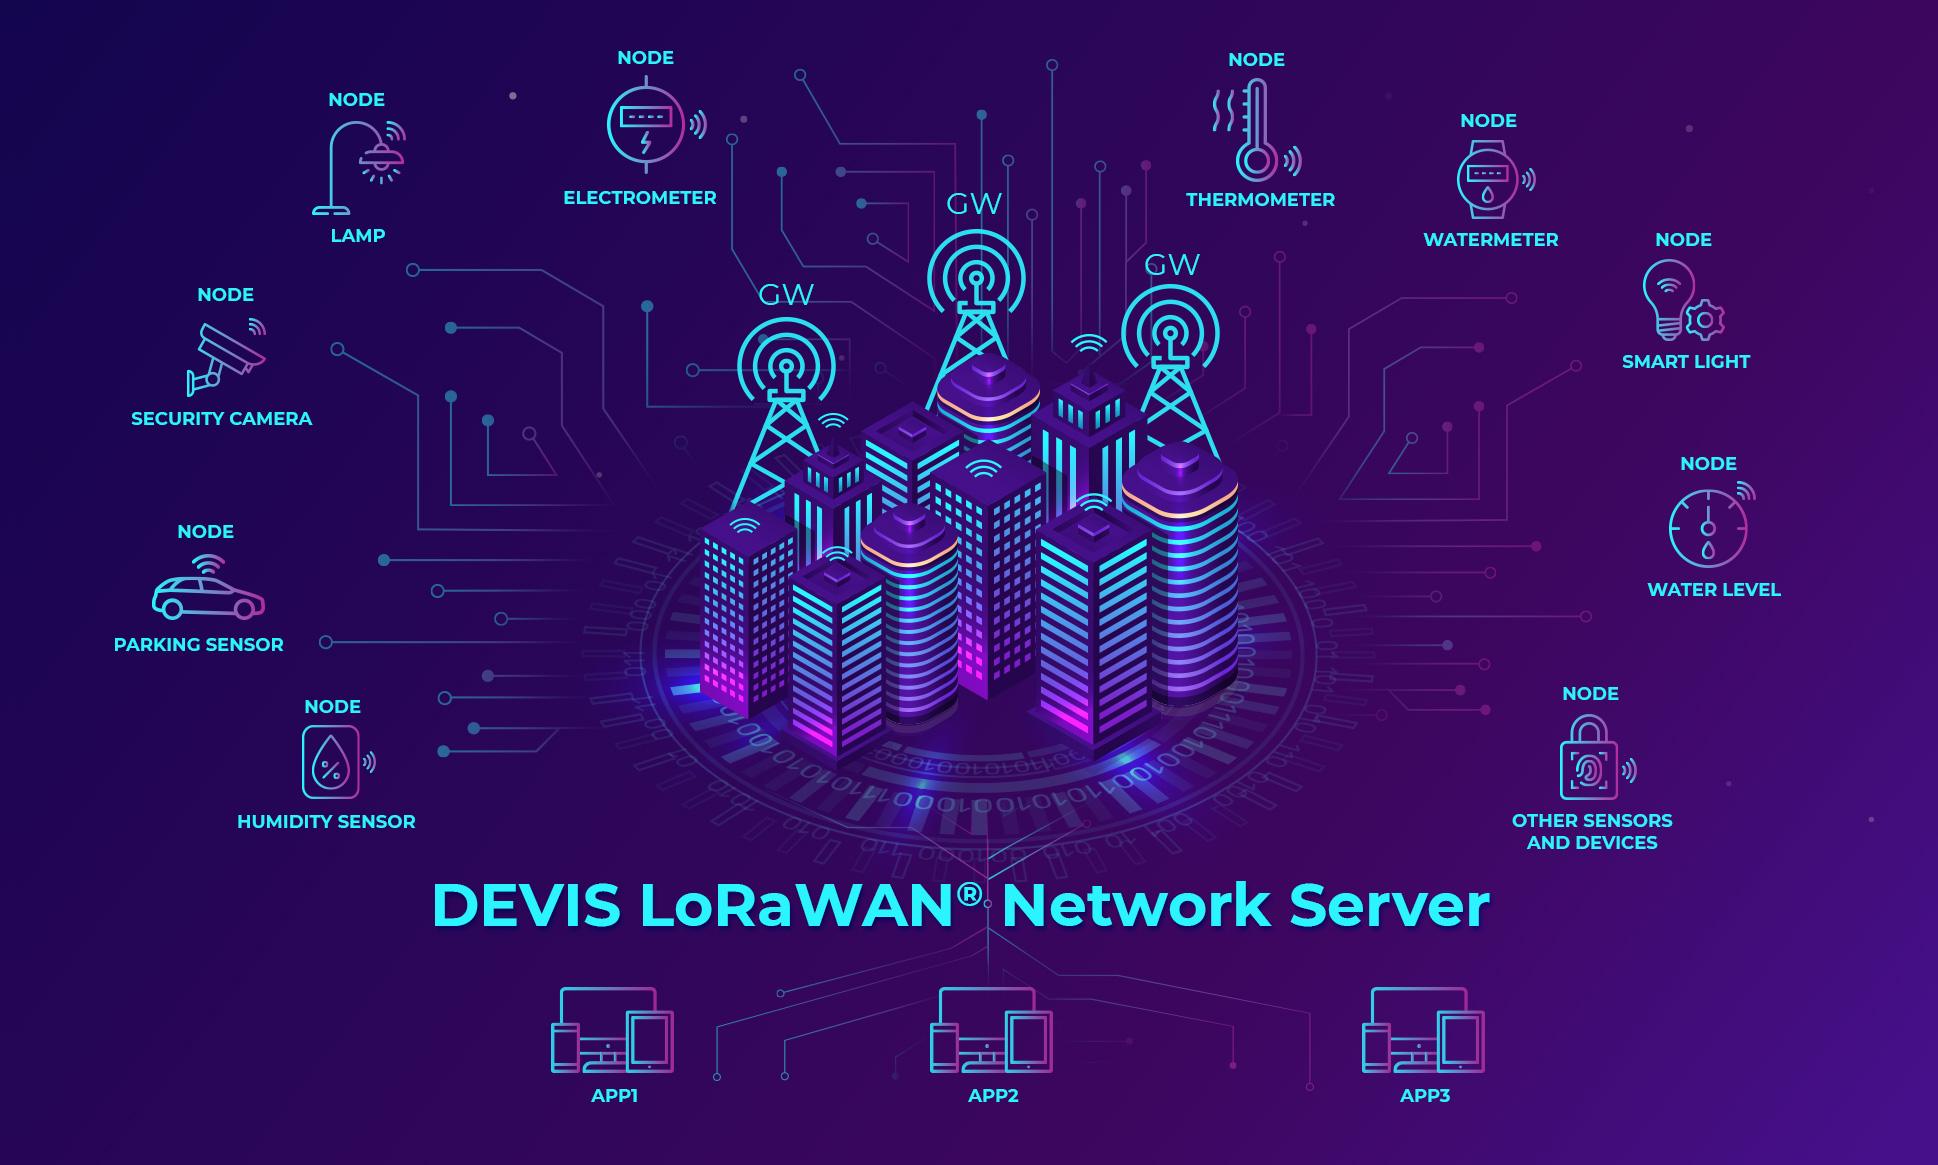 Devis LoRaWan Network server